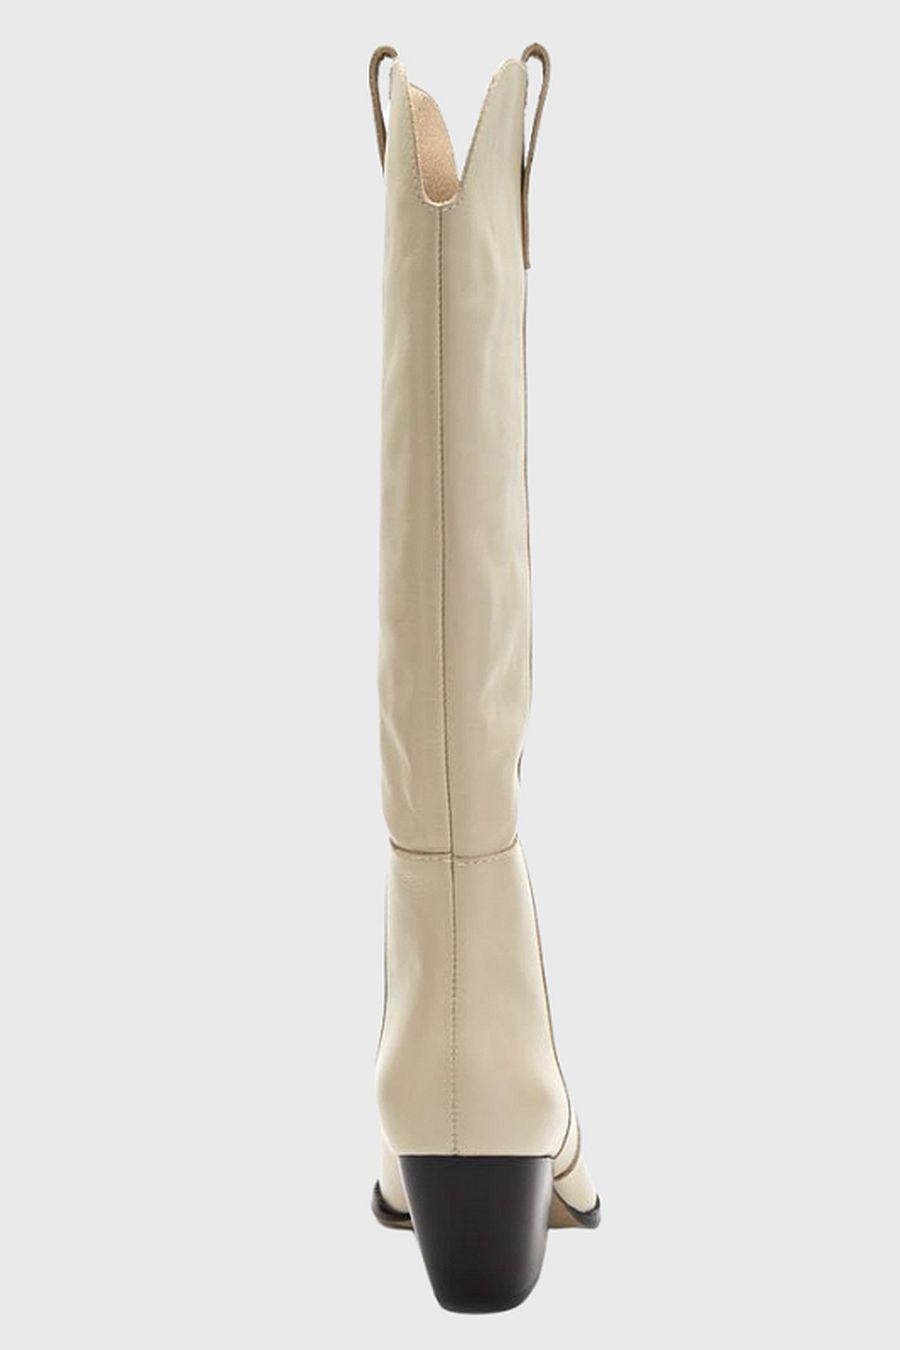 Matisse Footwear Stella Western Boot - bone